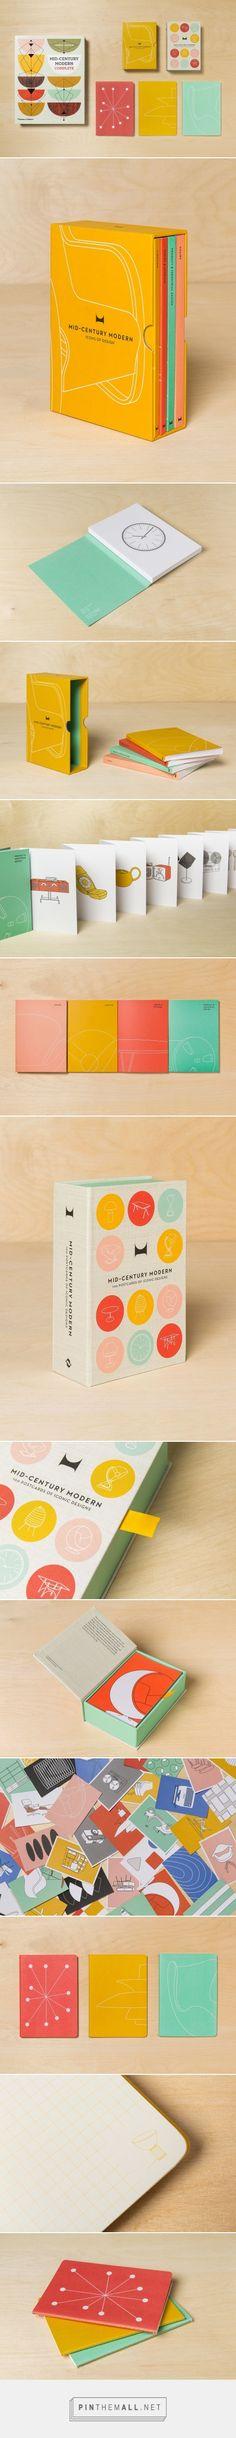 Mid Century Modern Branding by Here Design | Fivestar Branding – Design and Branding Agency & Inspiration Gallery